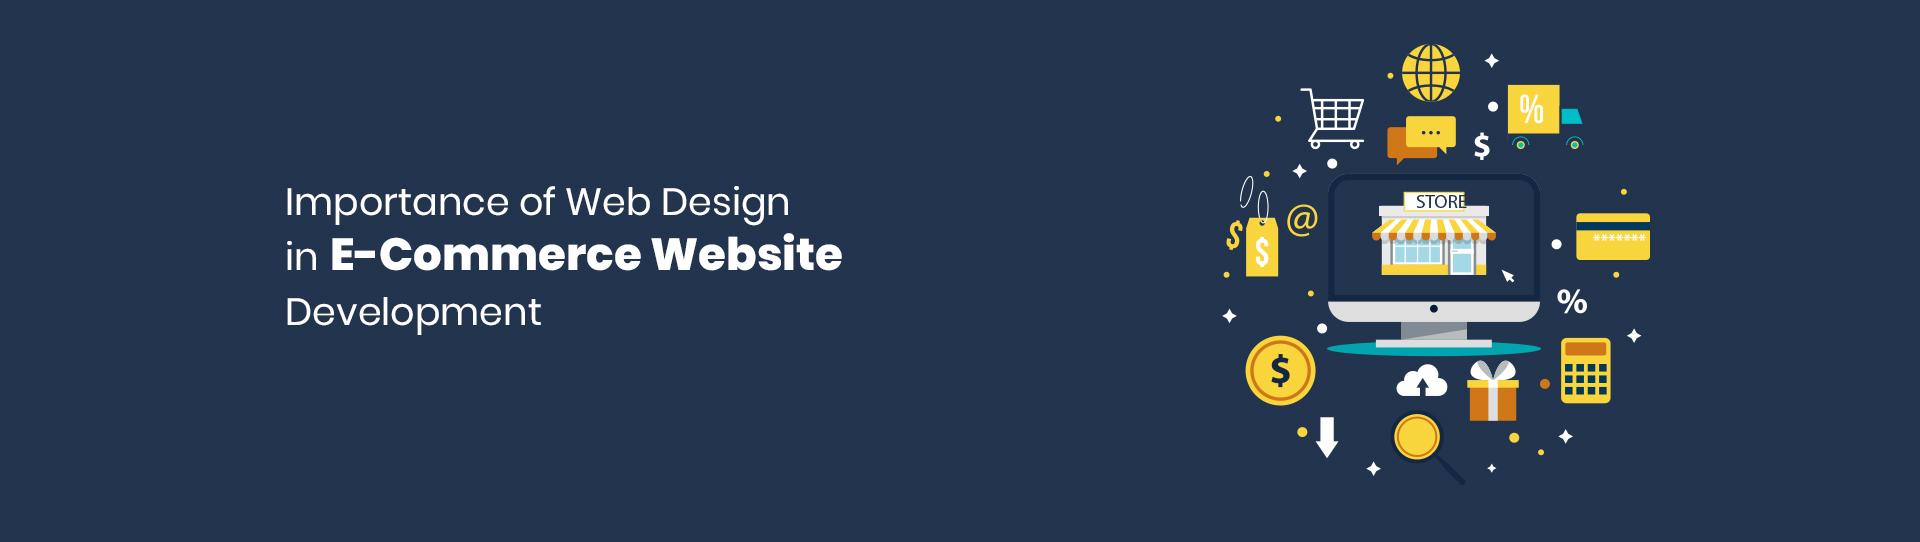 Importance Of Web Design In E Commerce Website Development 2base Technologies